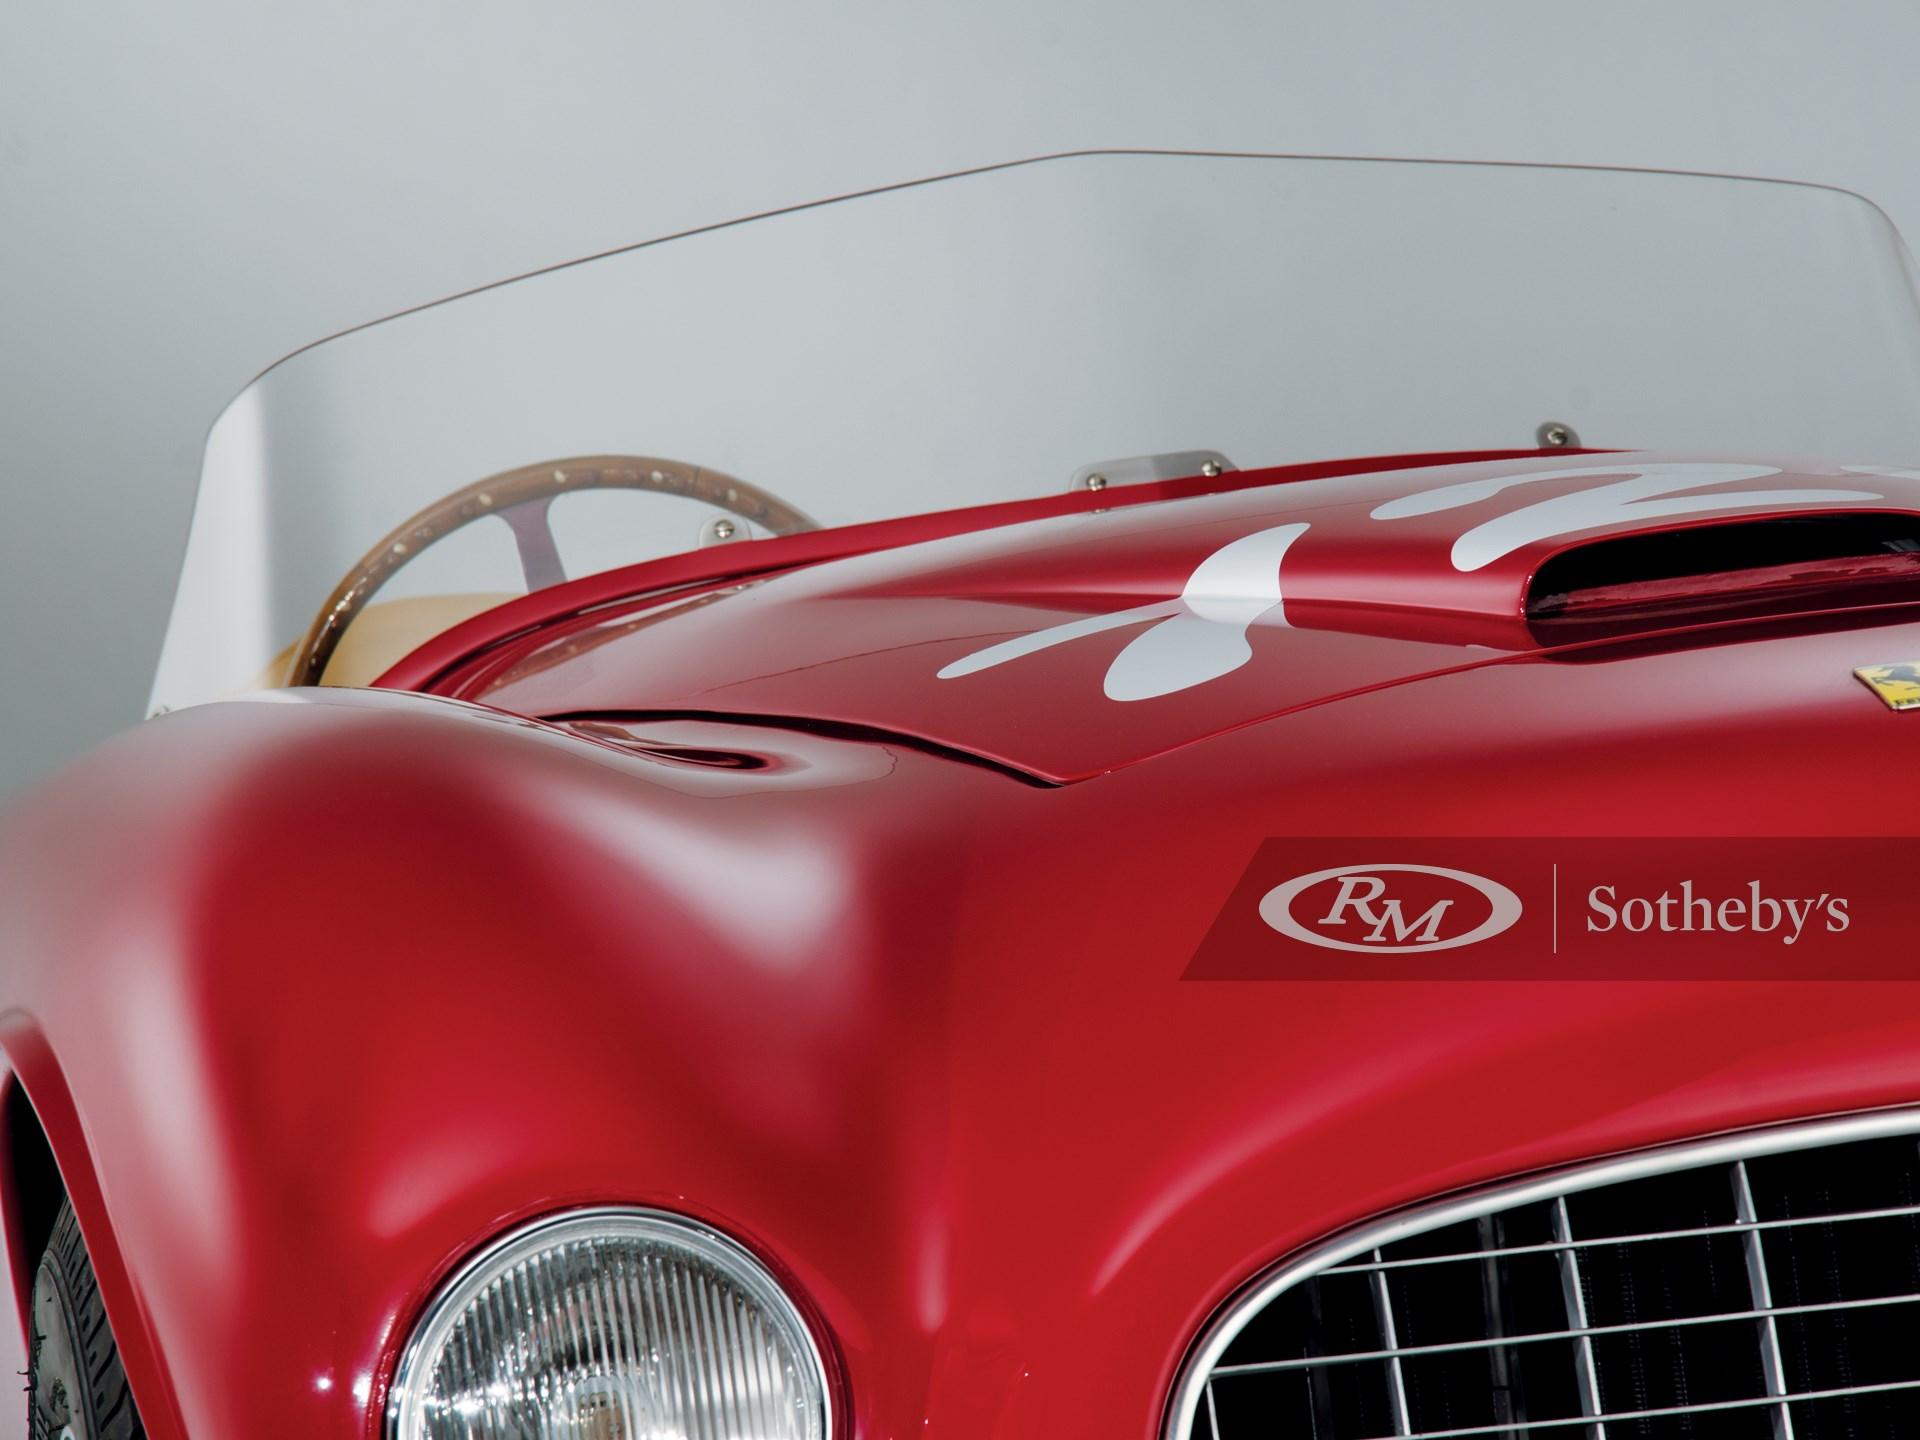 1948 Ferrari 166 Inter Spyder Corsa by Carrozzeria Fontana -